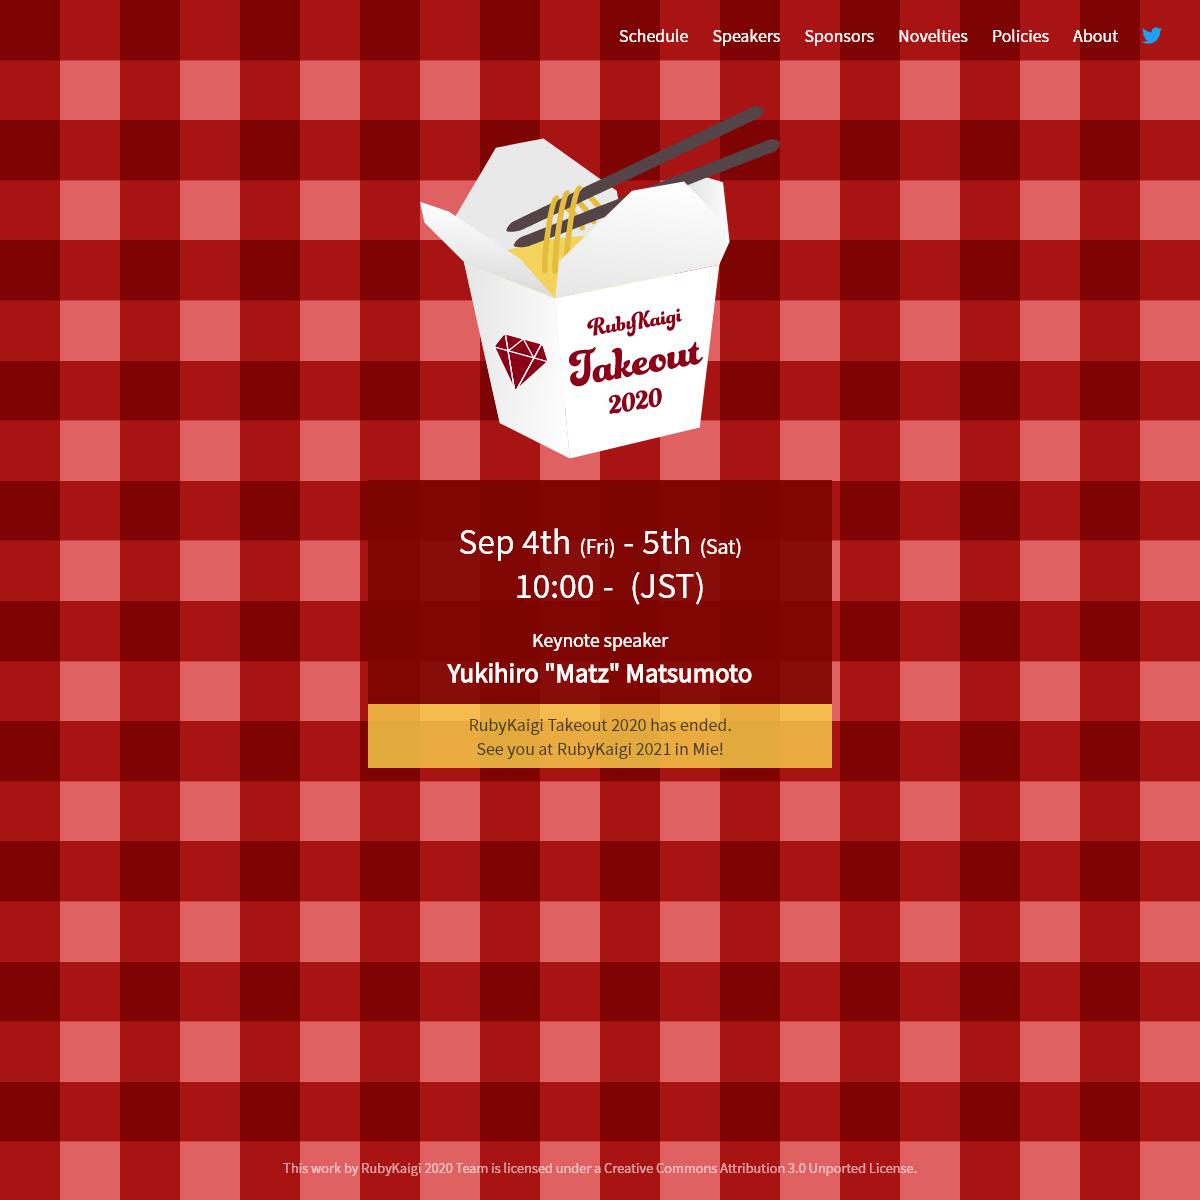 RubyKaigi Takeout 2020